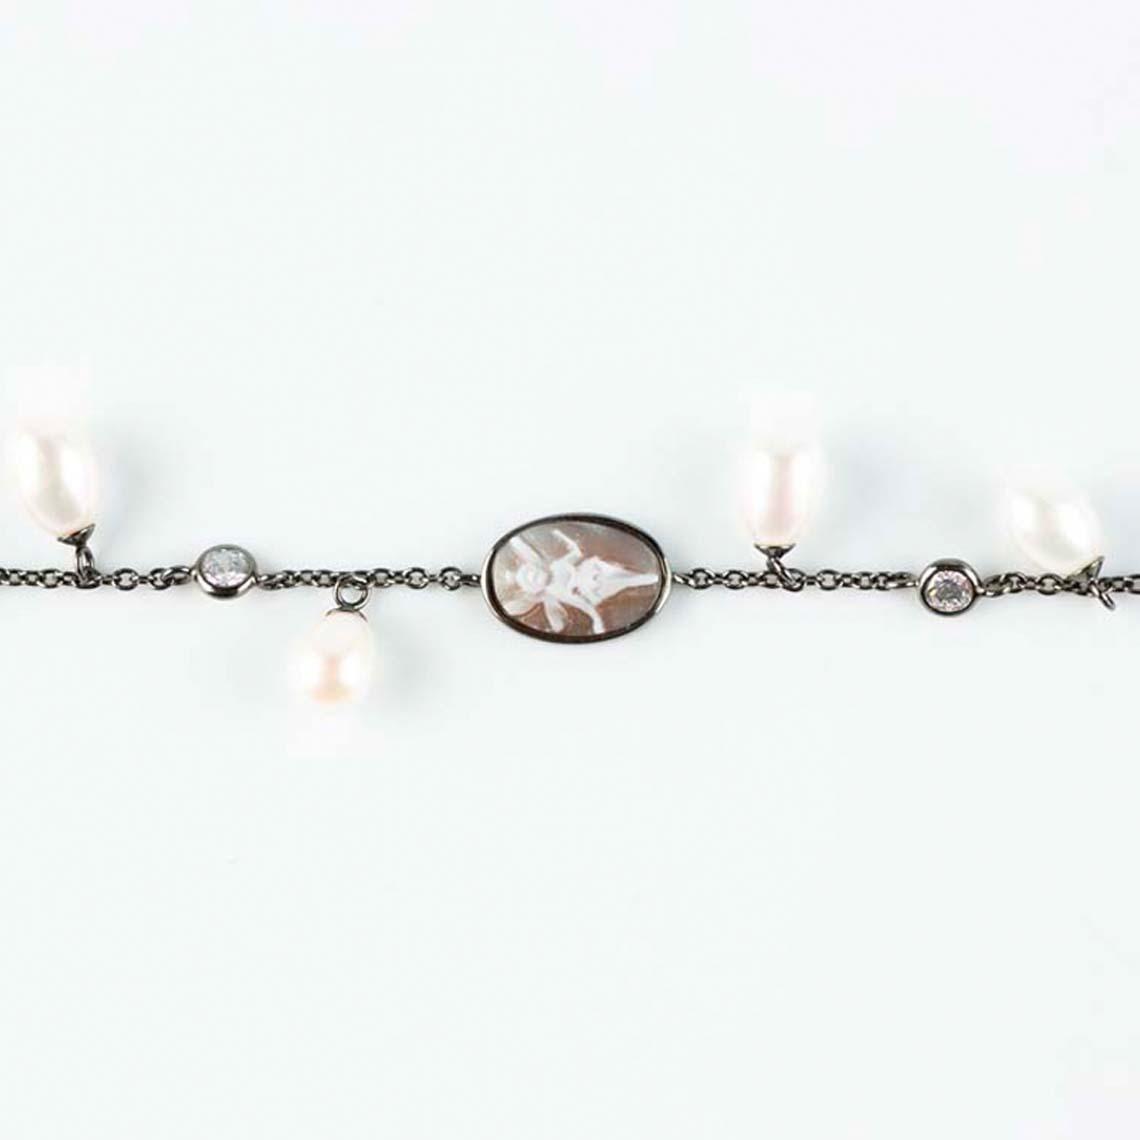 Italian cameo bracelet